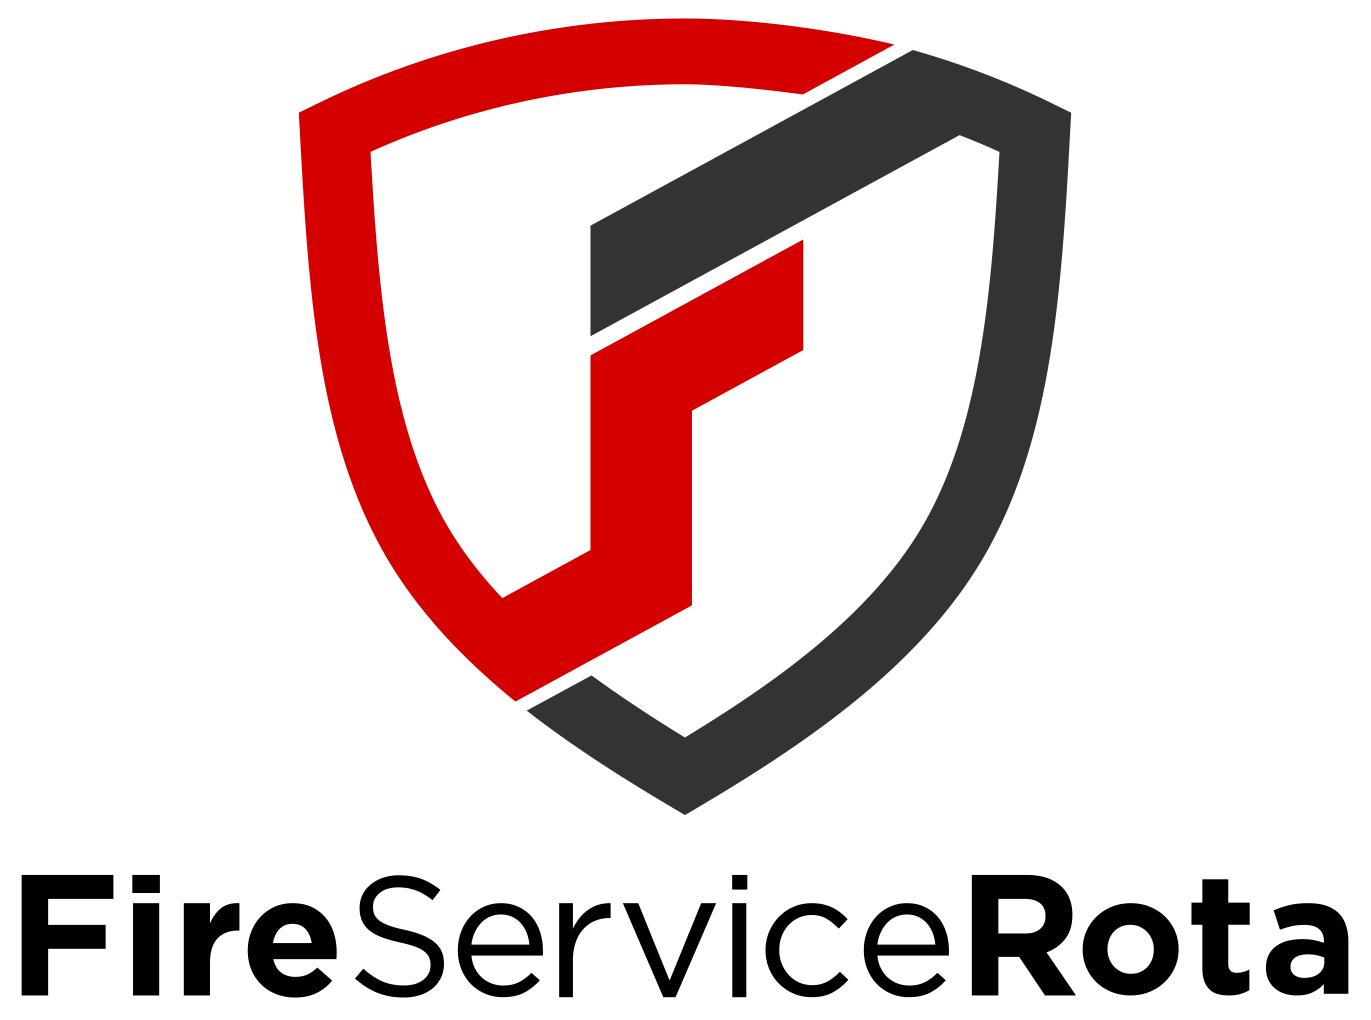 Fire Service Rota B.V